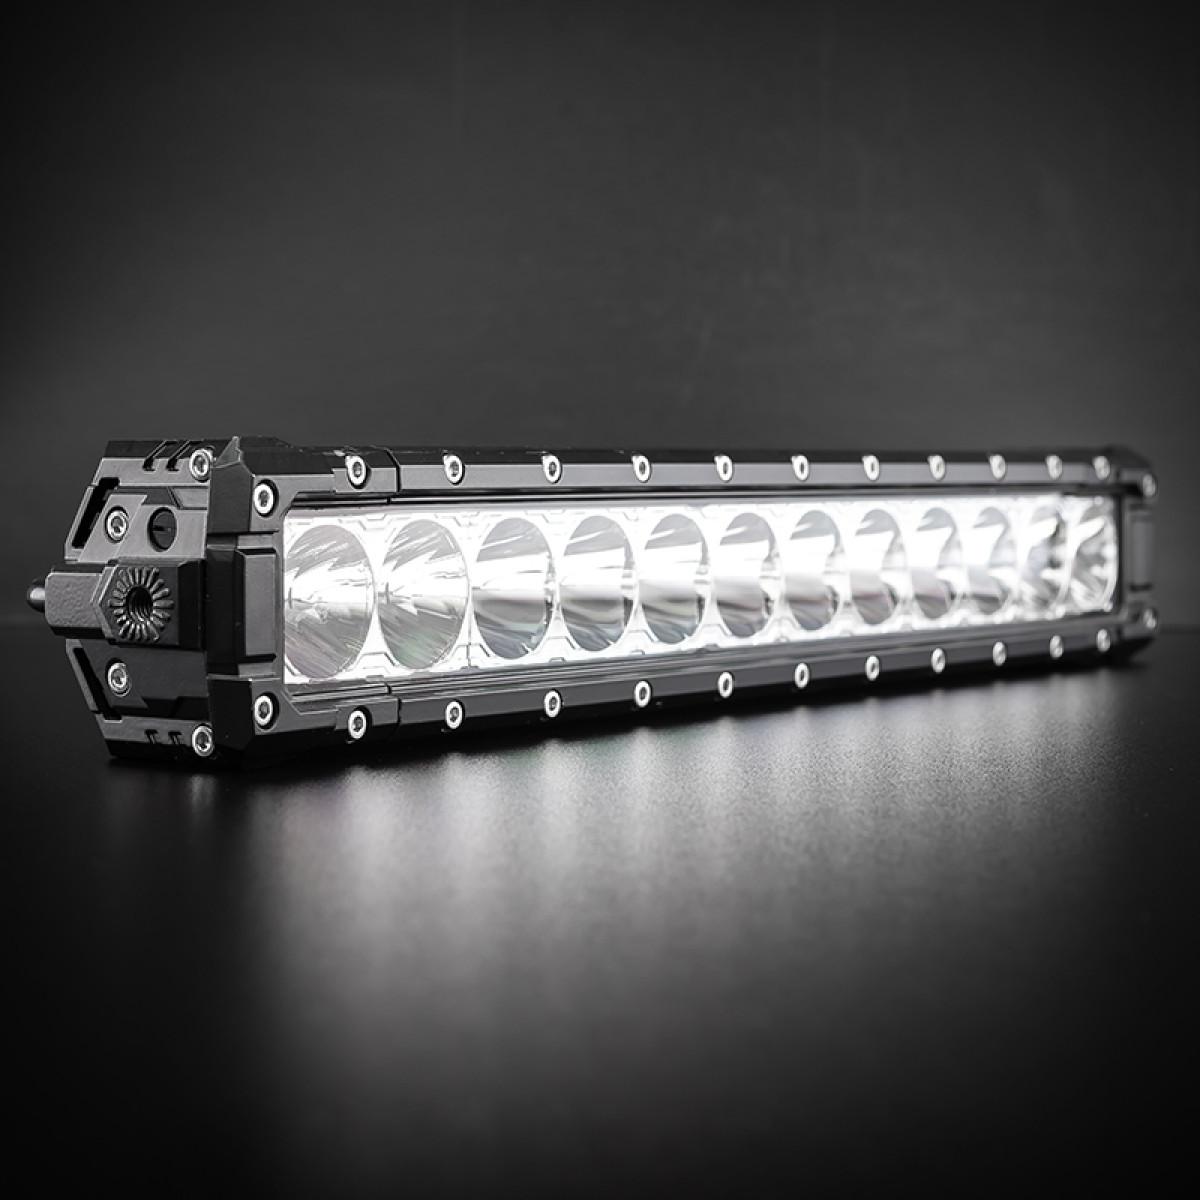 ST3301 18.6 INCH 12 CREE LED SINGLE ROW LIGHT BAR